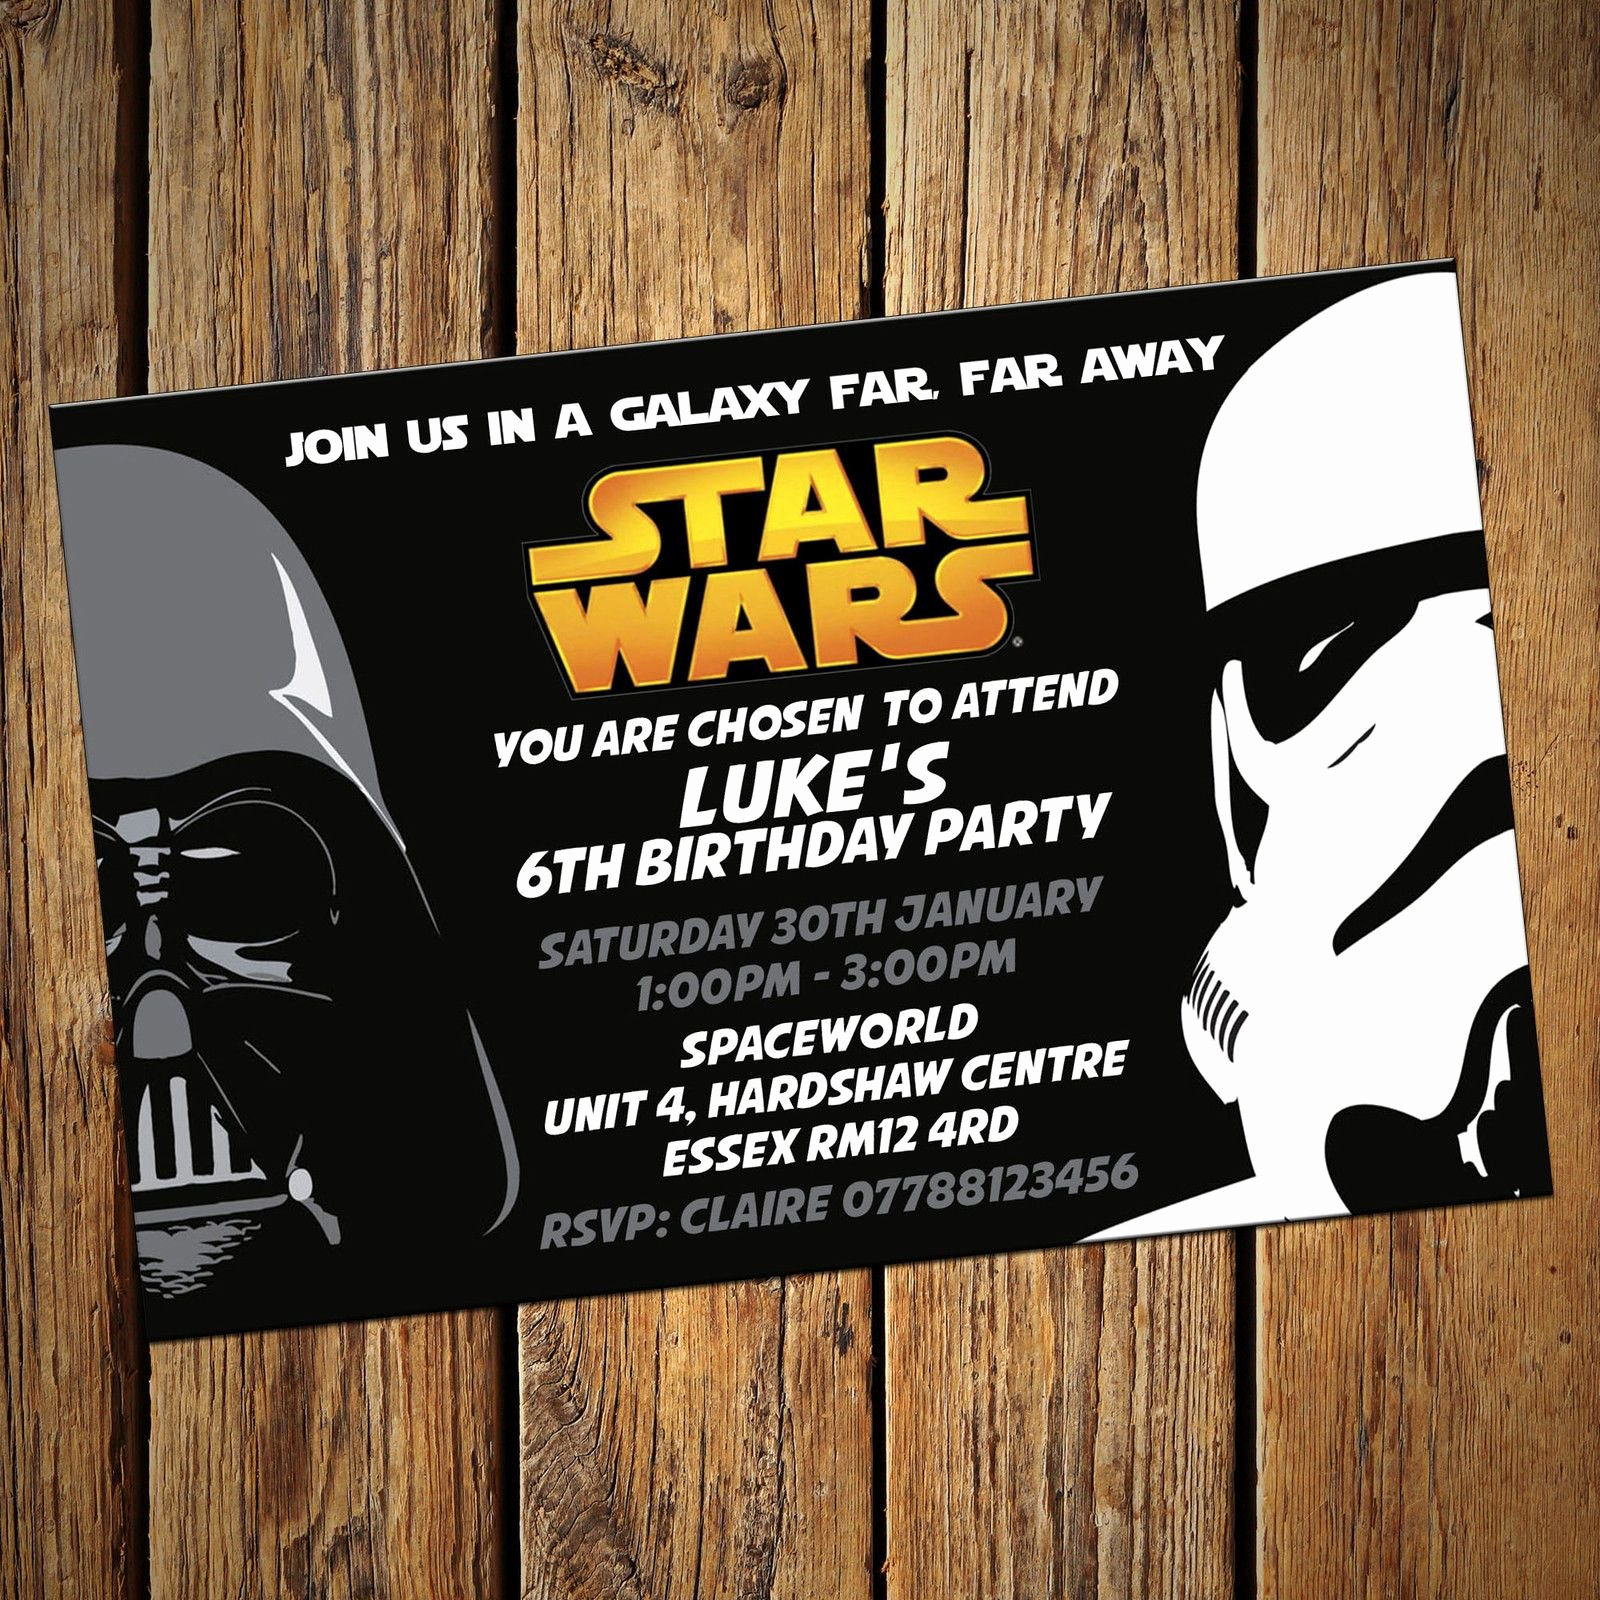 Star Wars Birthday Invitations Lovely Personalised Star Wars Invitations Party Invites Ics